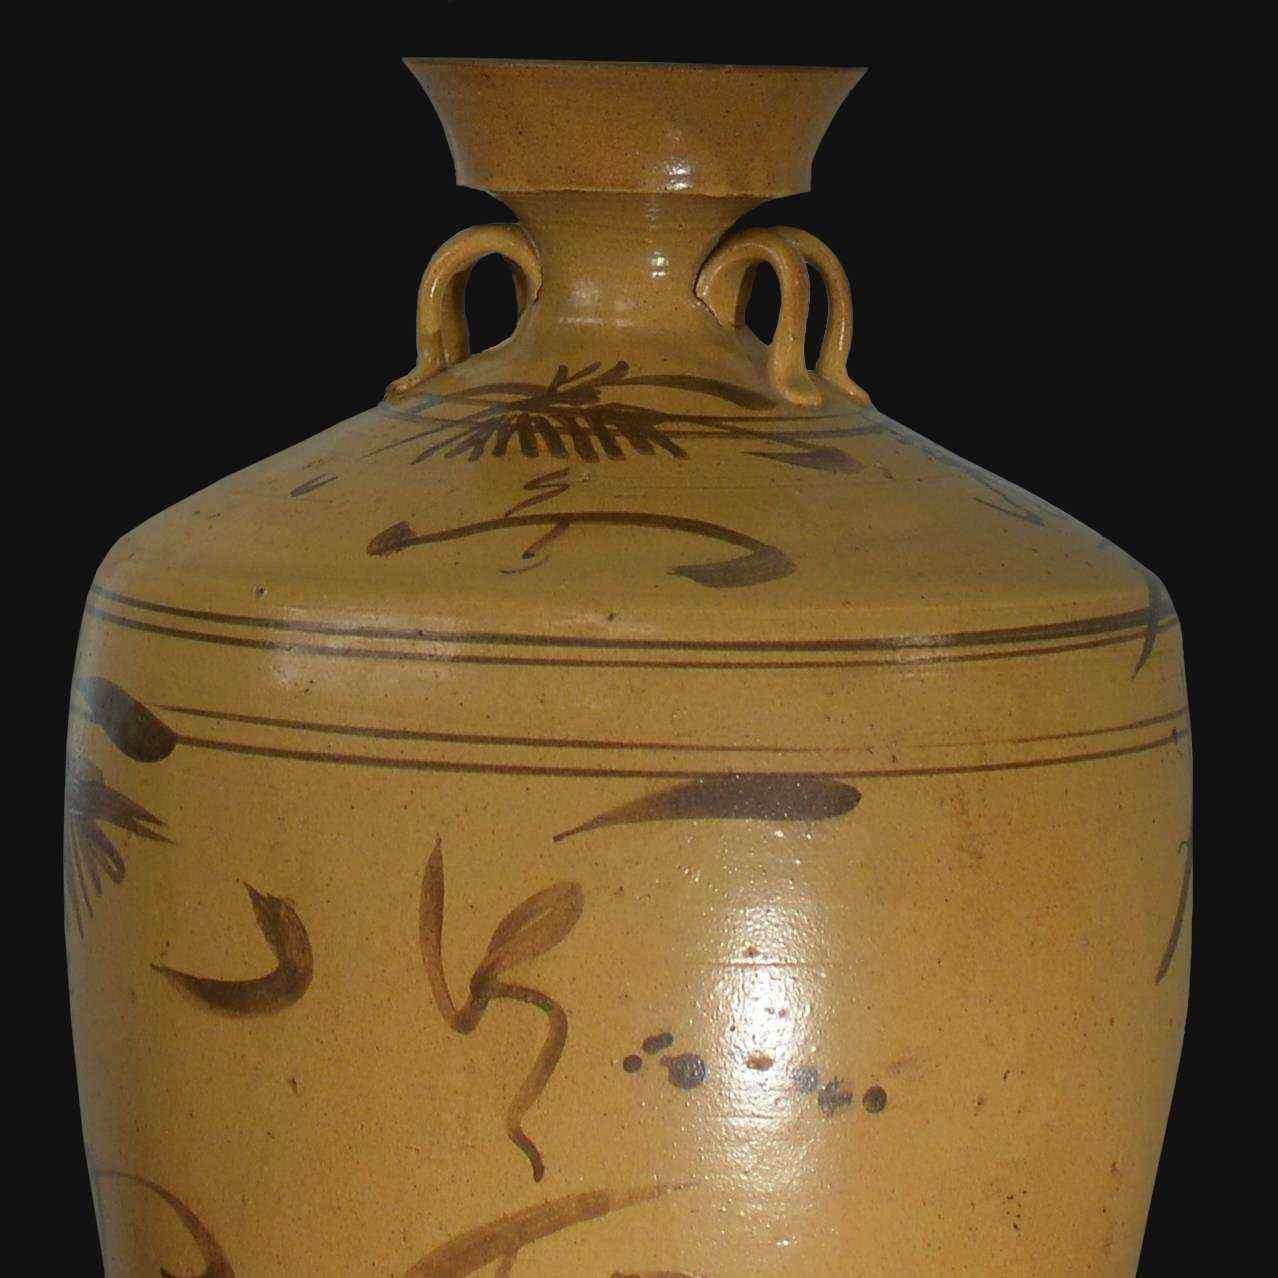 Chinese vase, Ming period 1368 - 1644